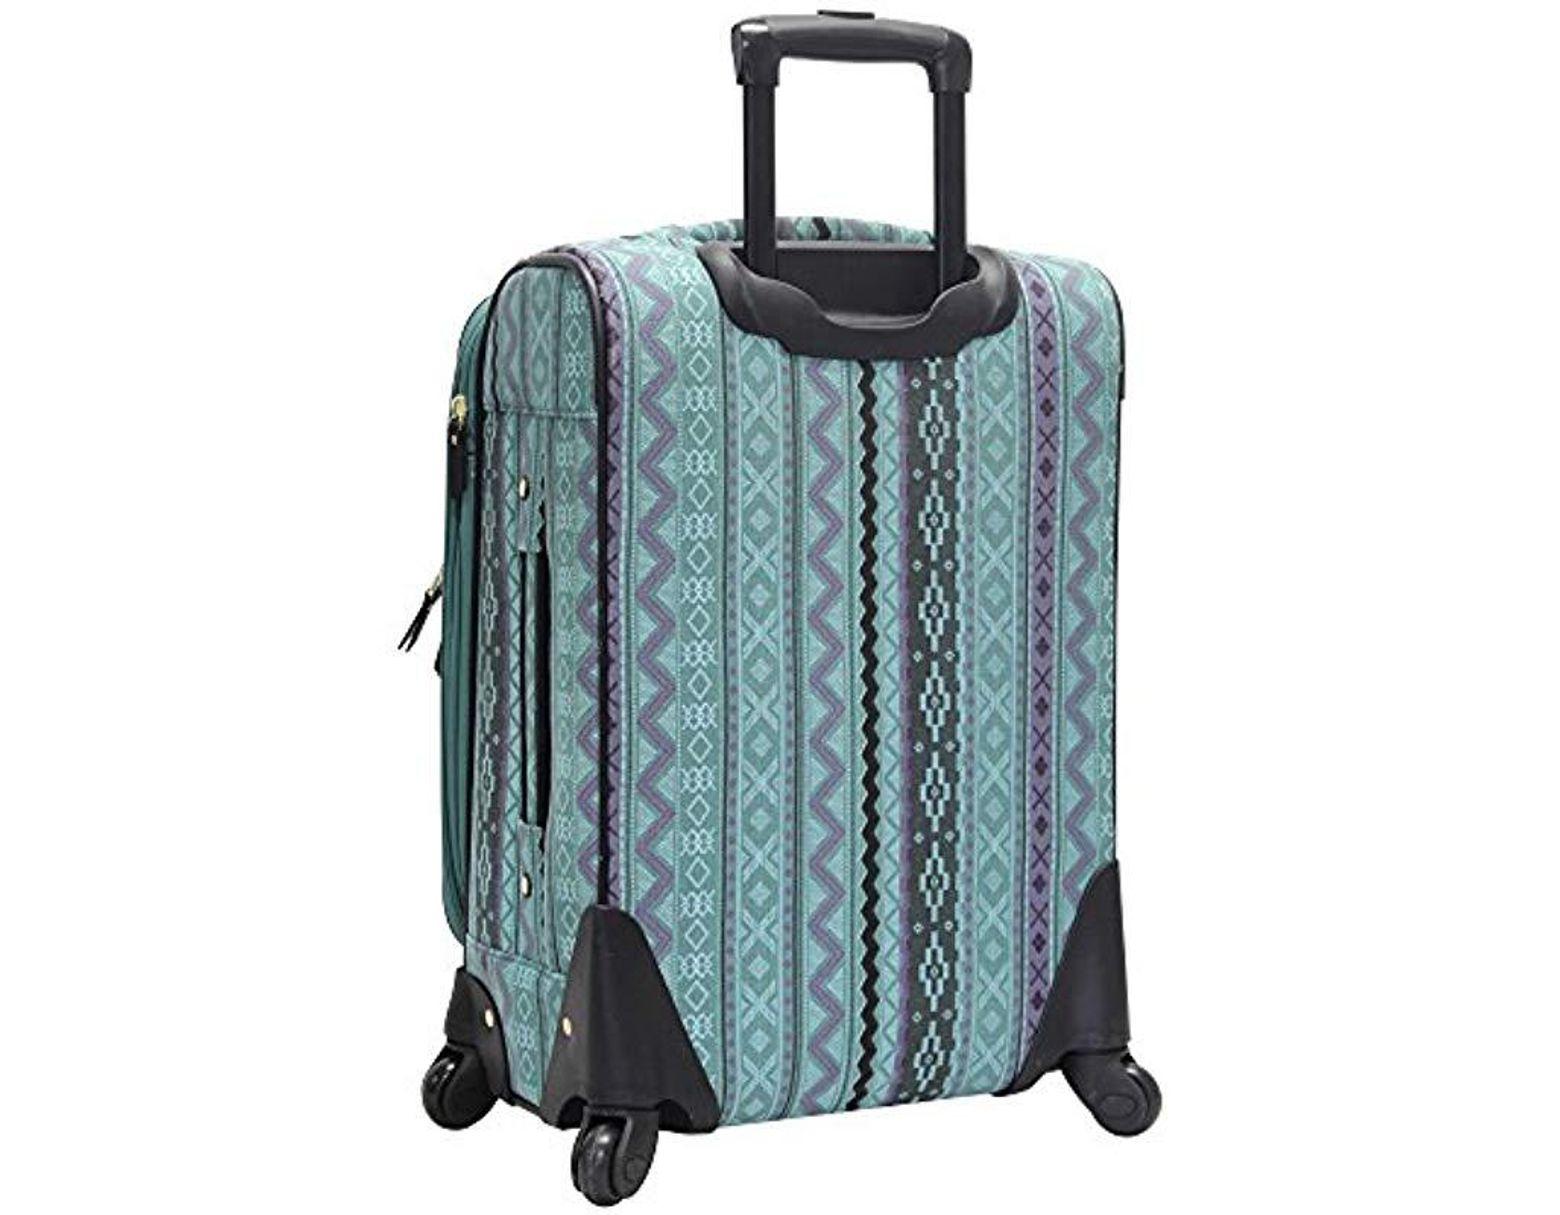 f5b4f9eaf505 Steve Madden Luggage Legends 20